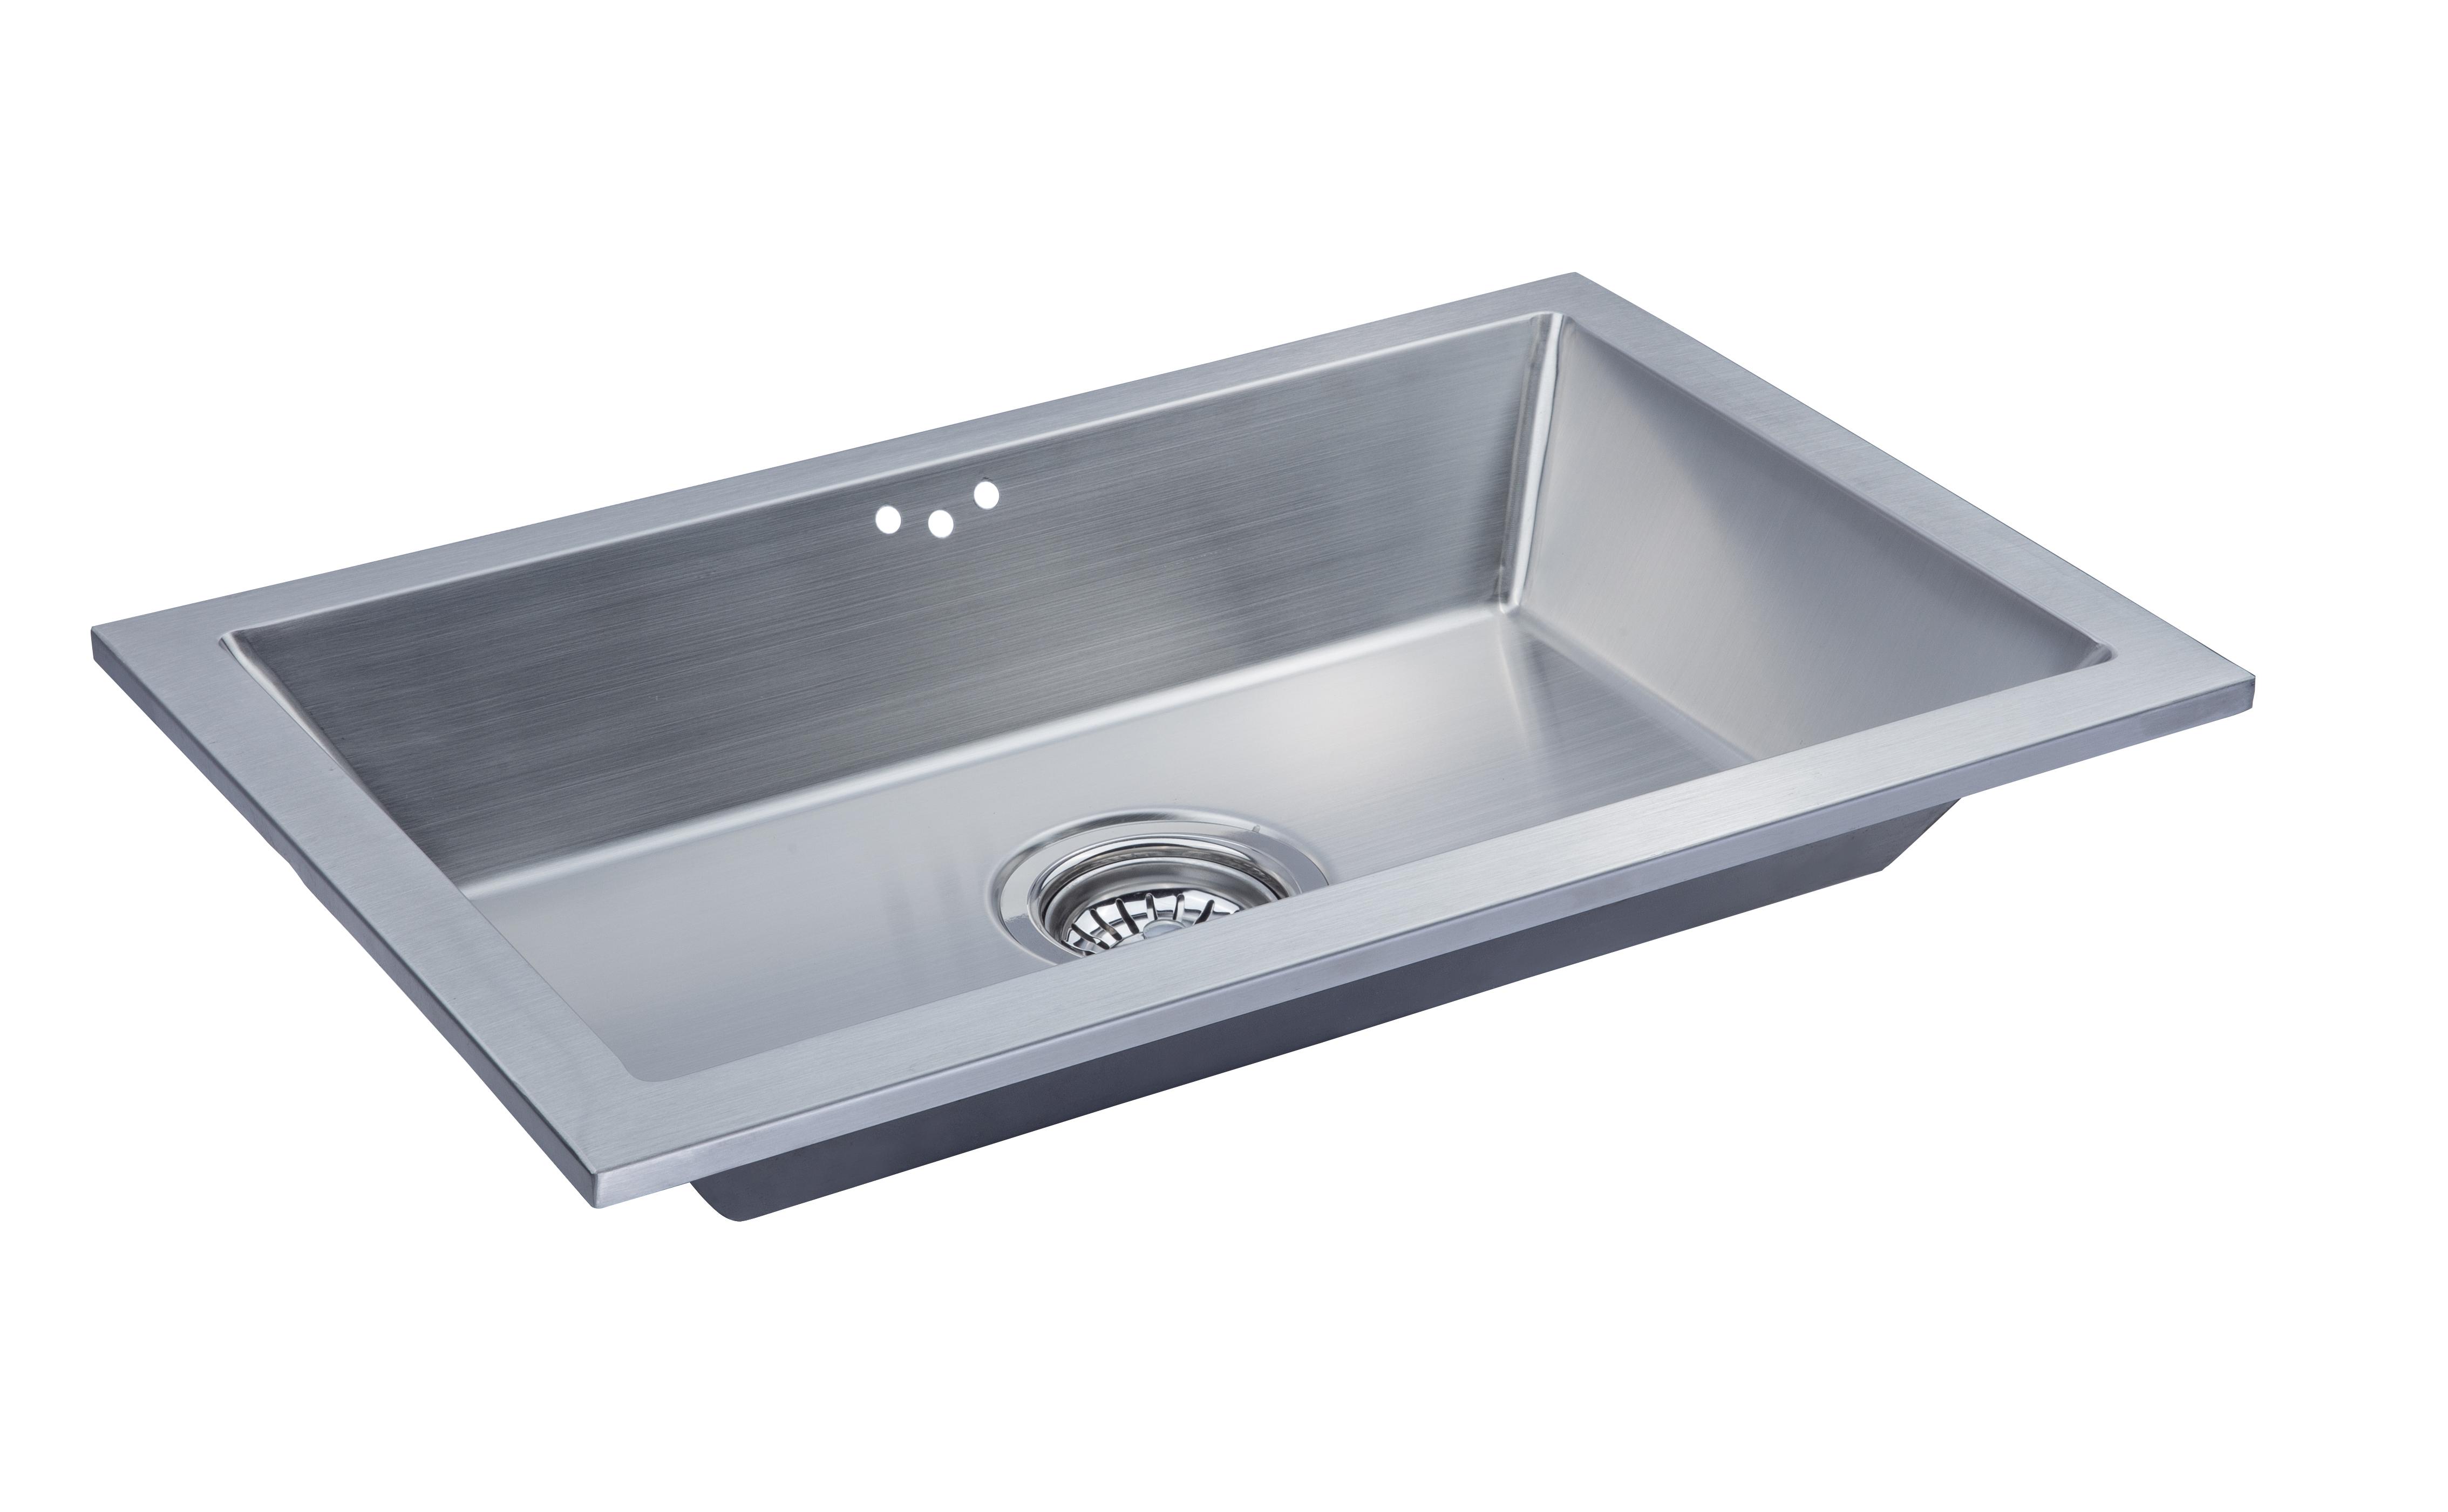 Delightful AS360 24u2033 X 15.63u2033 X 4u2033 18G Single Bowl Dual Mount Legend Stainless Steel Bathroom  Sink